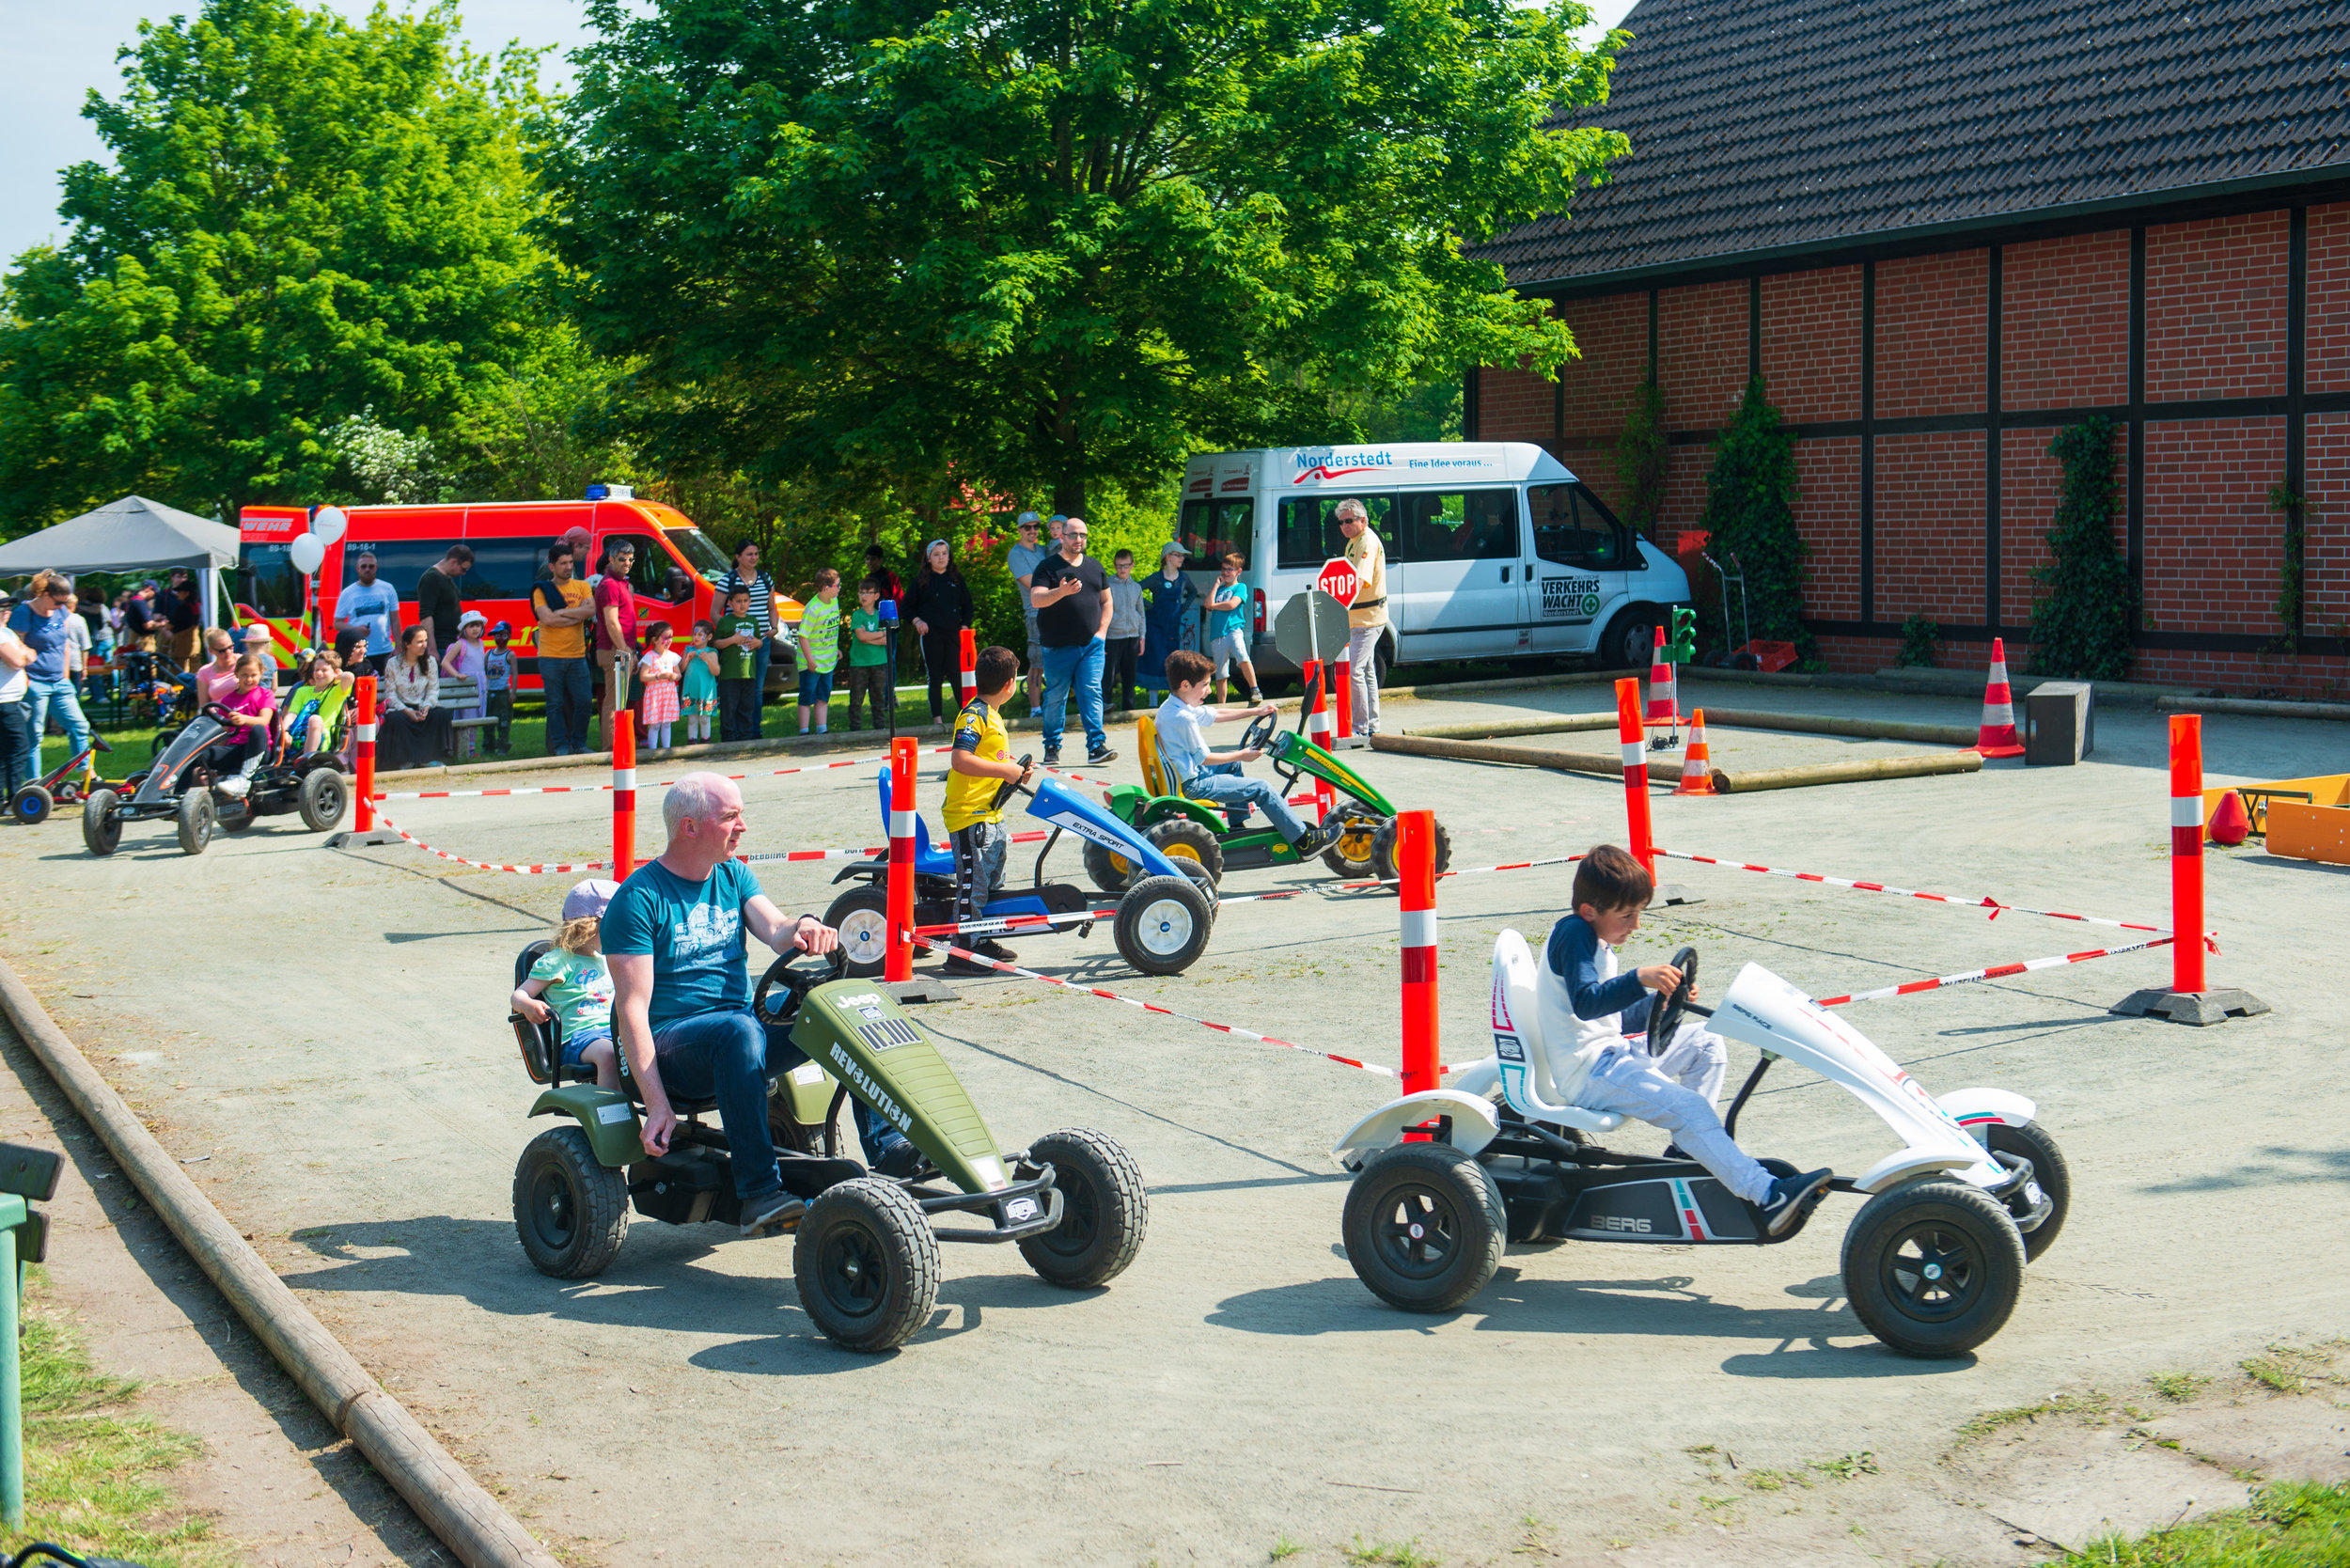 13-Norderstedter-Museumsfest-2019-FWM--XO-Dennys-Mamero-WEB-36.jpg